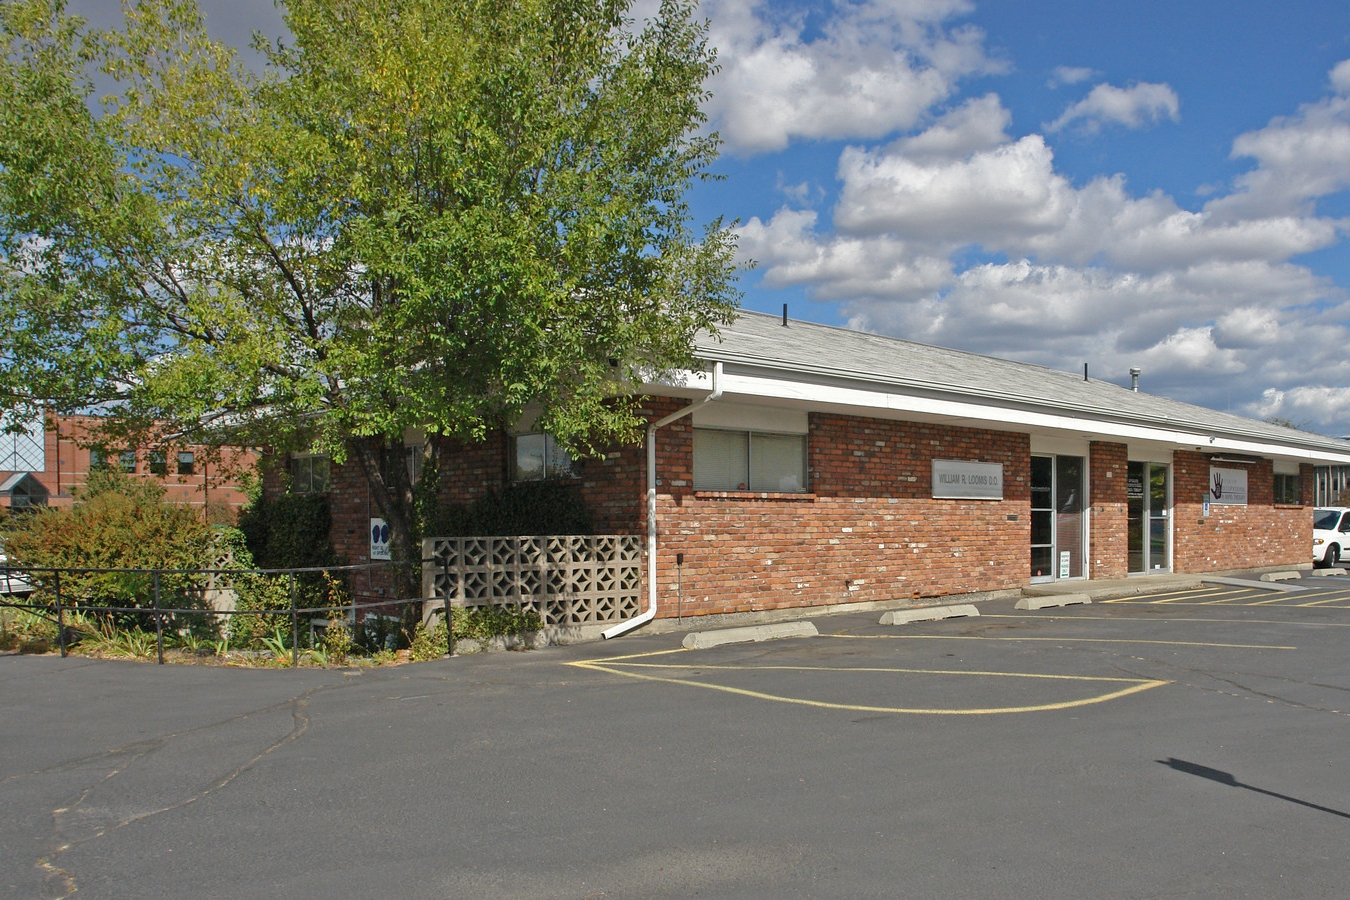 Medical/Office Space in North Spokane  Sale: $260,000